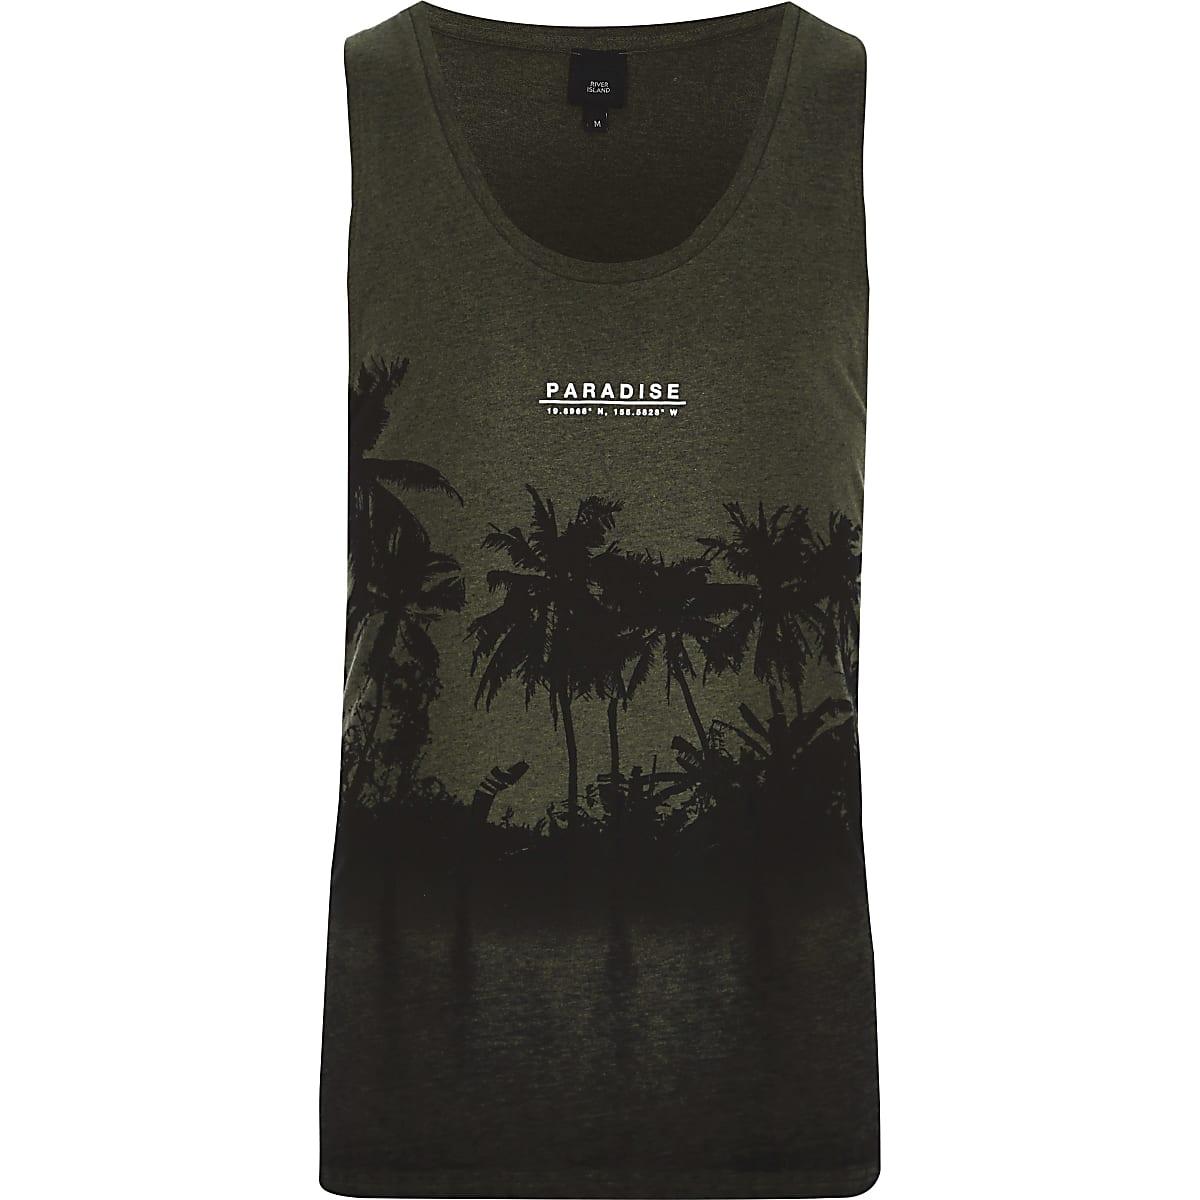 5f52db7c1f299f ... Donkergroen burnout hemdje met 'Paradise'- en palmboomprint ...